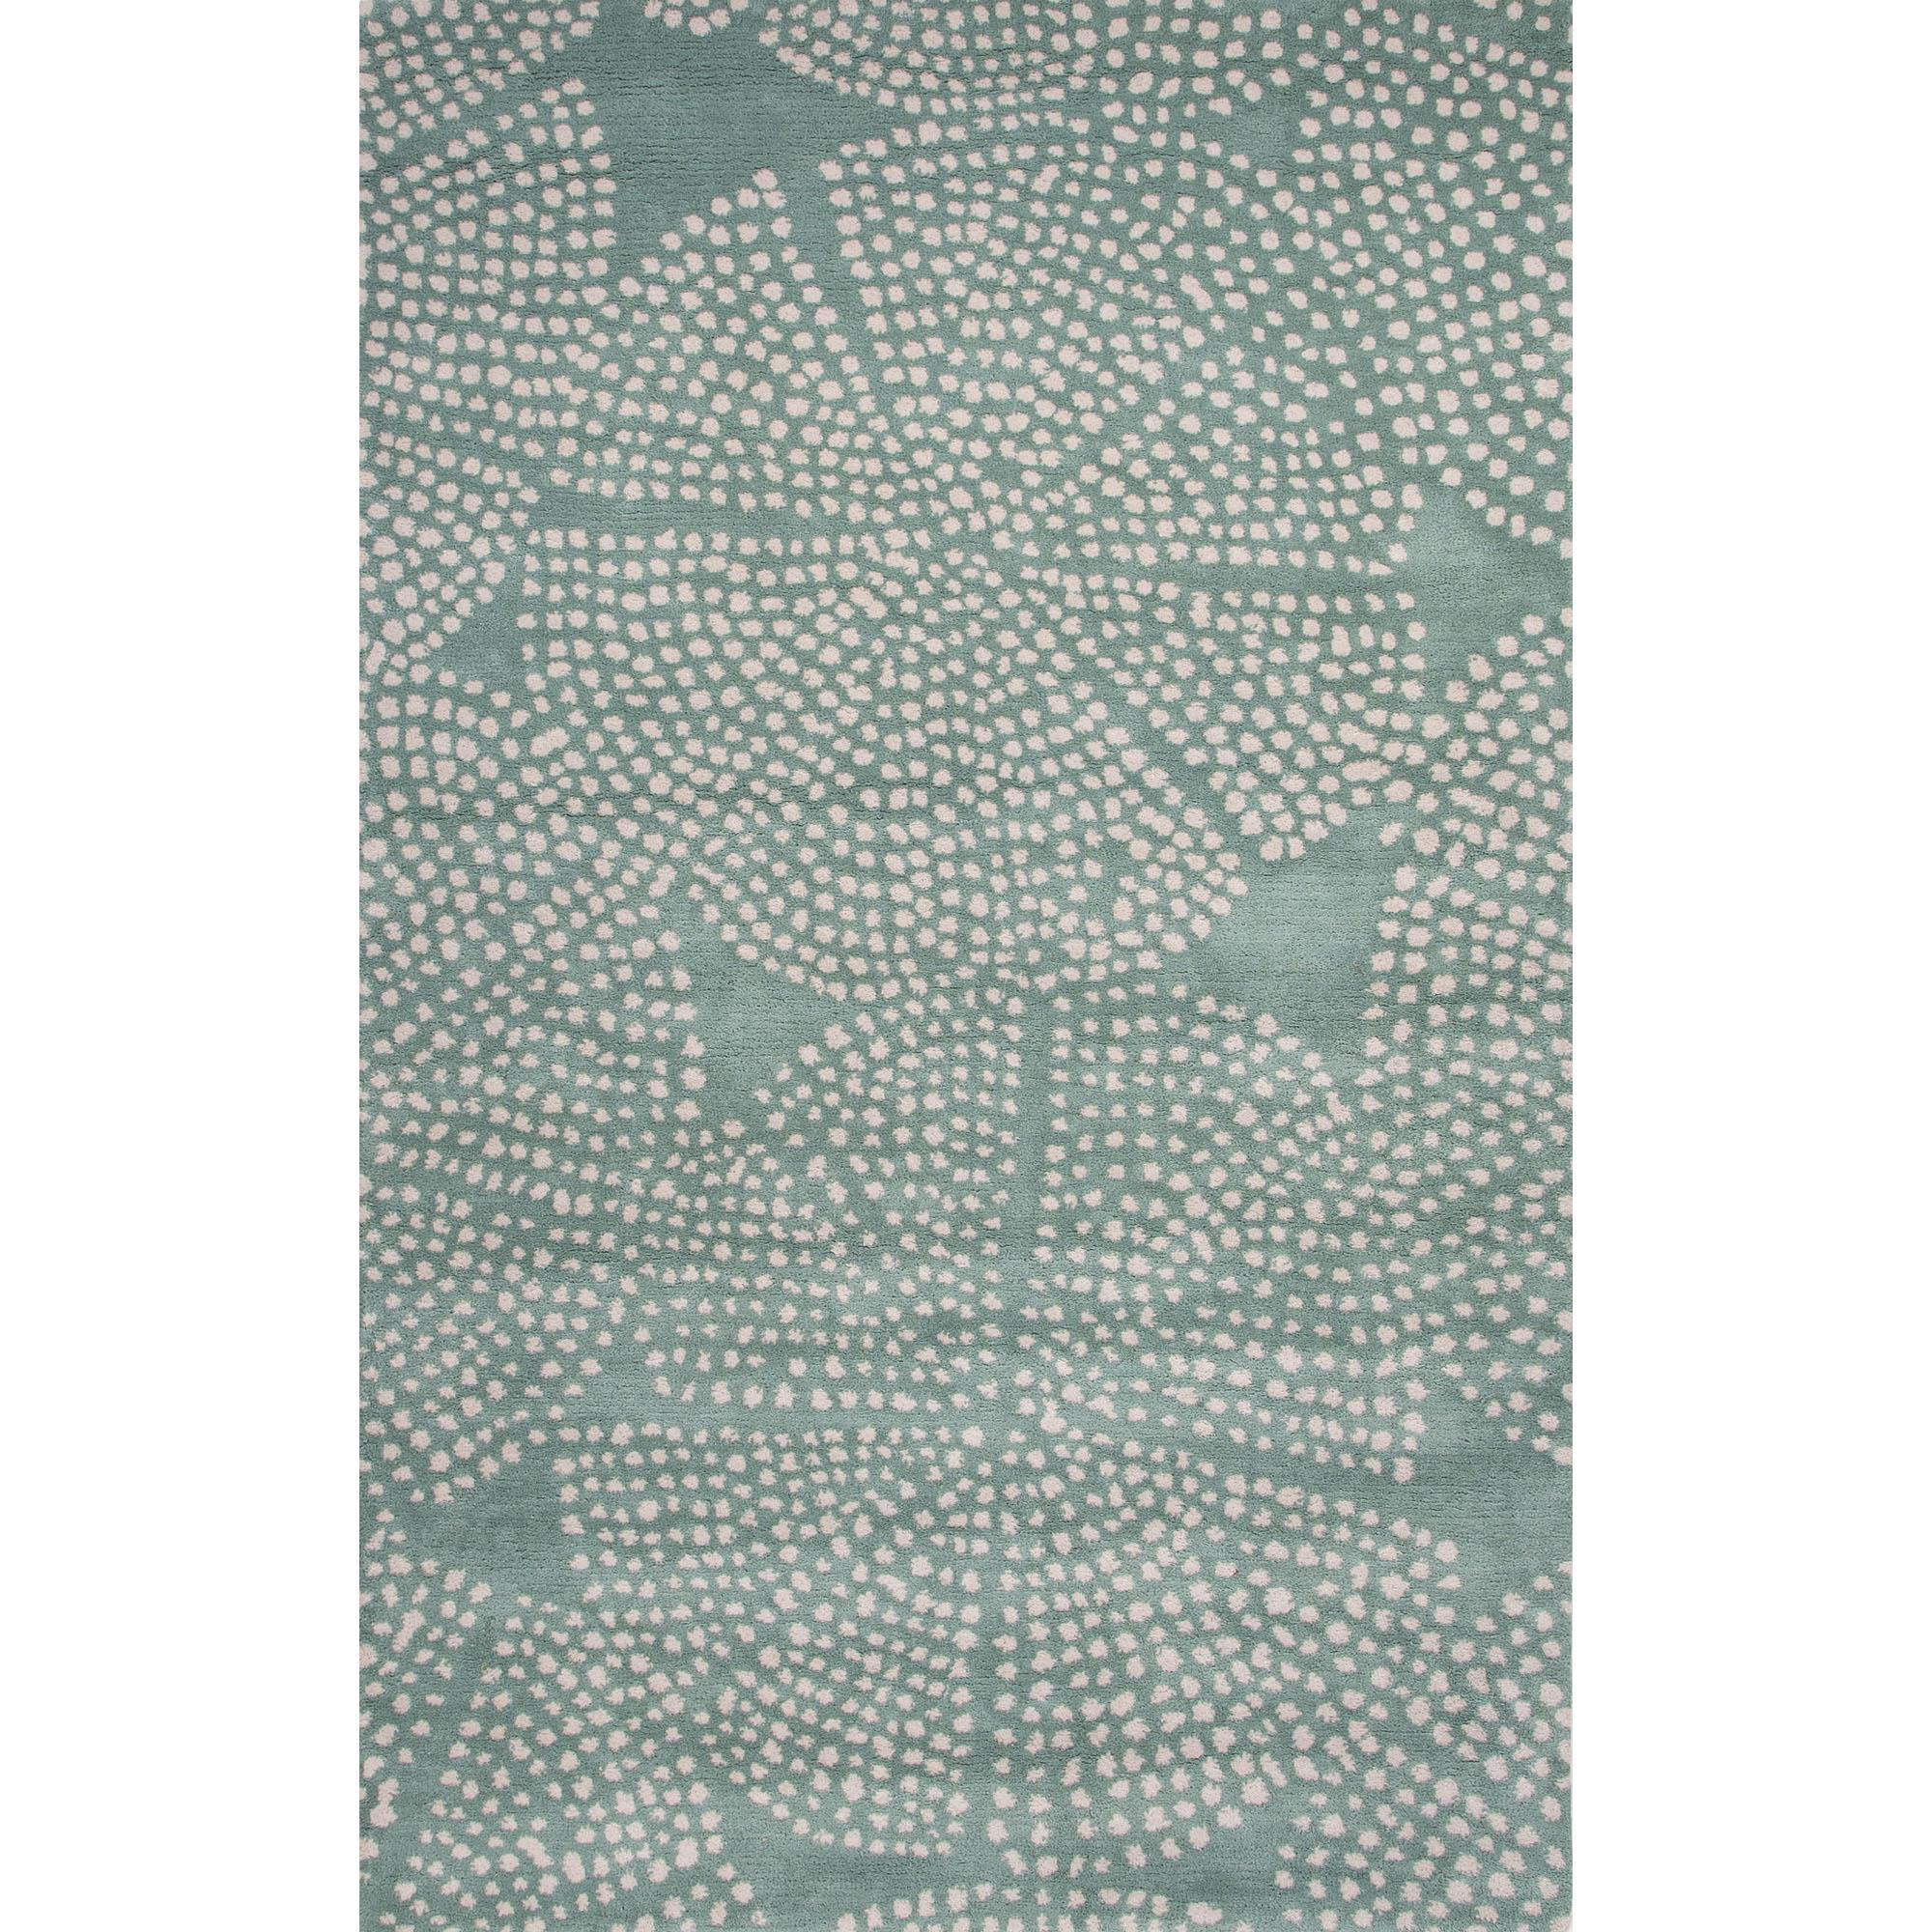 JAIPUR Rugs En Casa By Luli Sanchez Tufted 8 x 11 Rug - Item Number: RUG118132